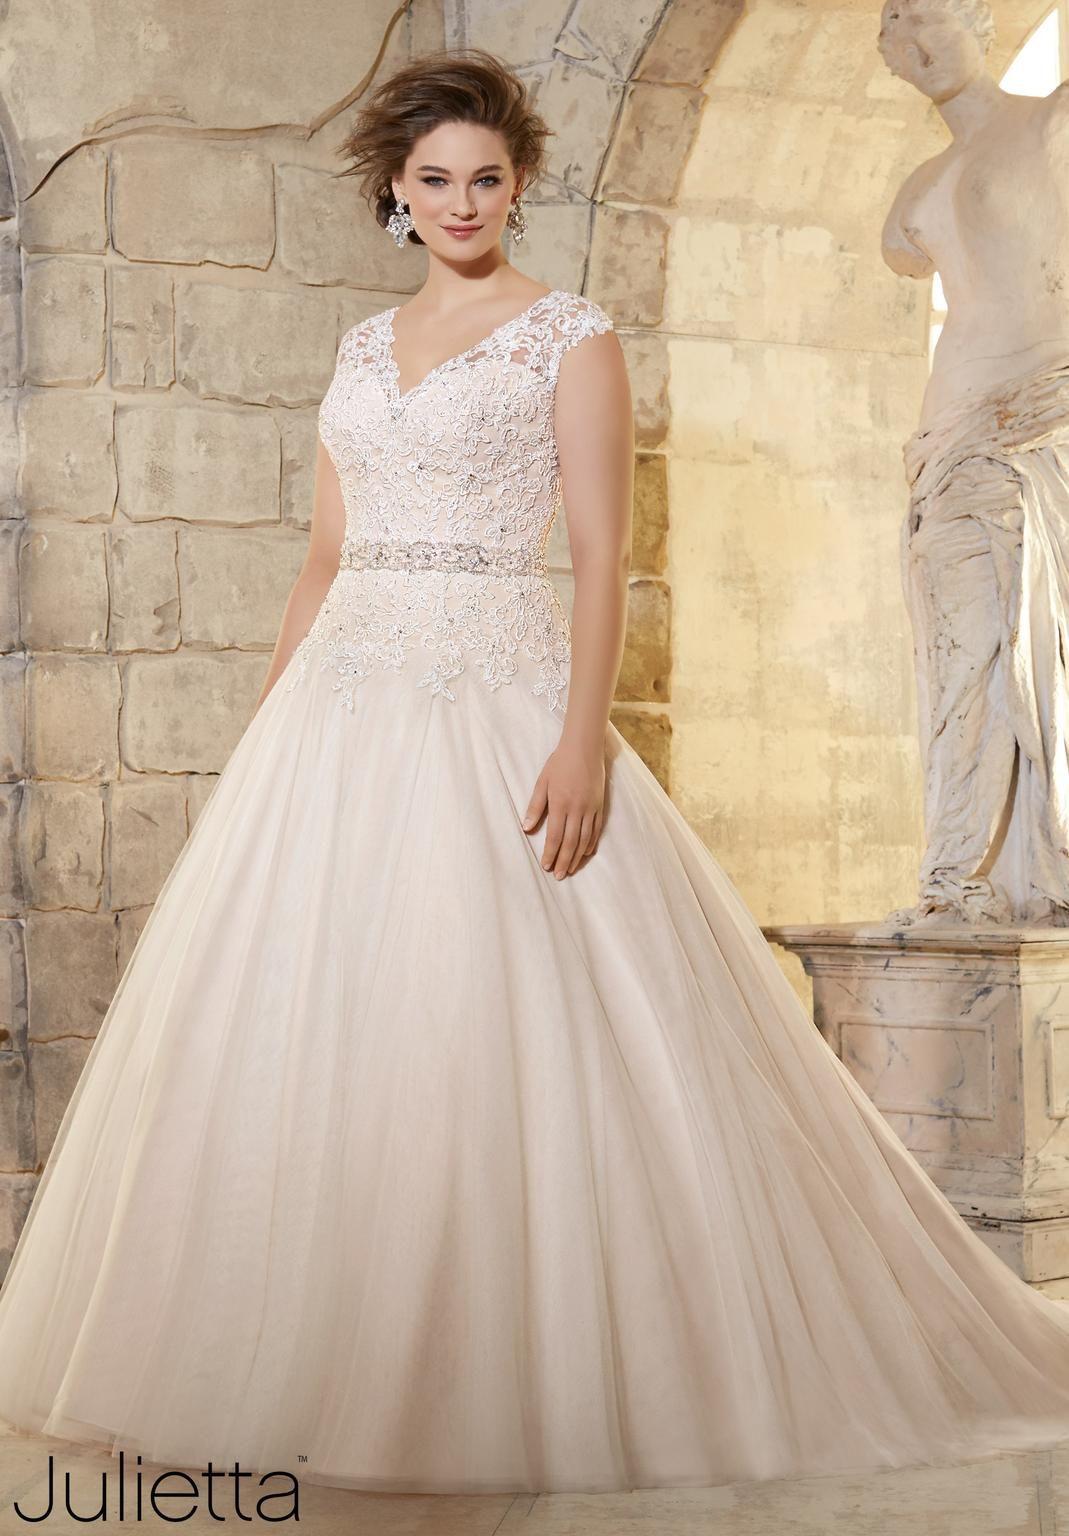 Mori lee madeline gardner wedding dress  wedding mybidday Madeline Gardner Mori Lee Julietta